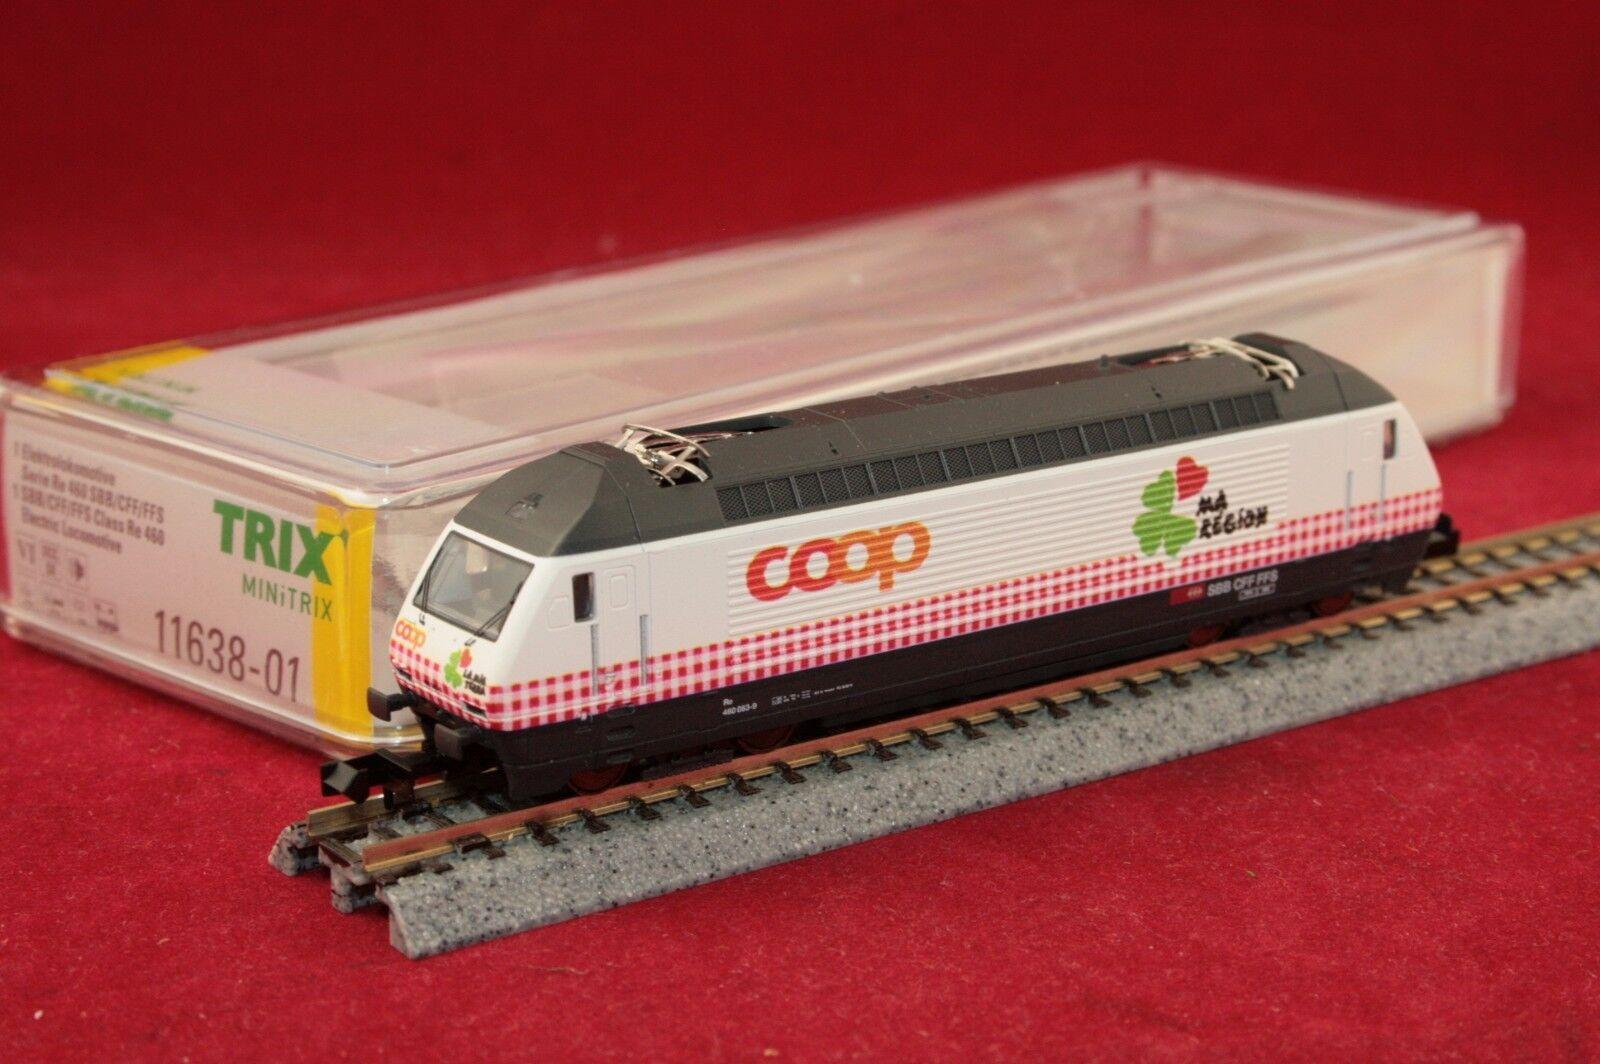 Minitrix 11638-1 11638-1 11638-1 Spur N SBB E-Lok Re 460 083-9 COOP Digital Sound NEU OVP 02a40a